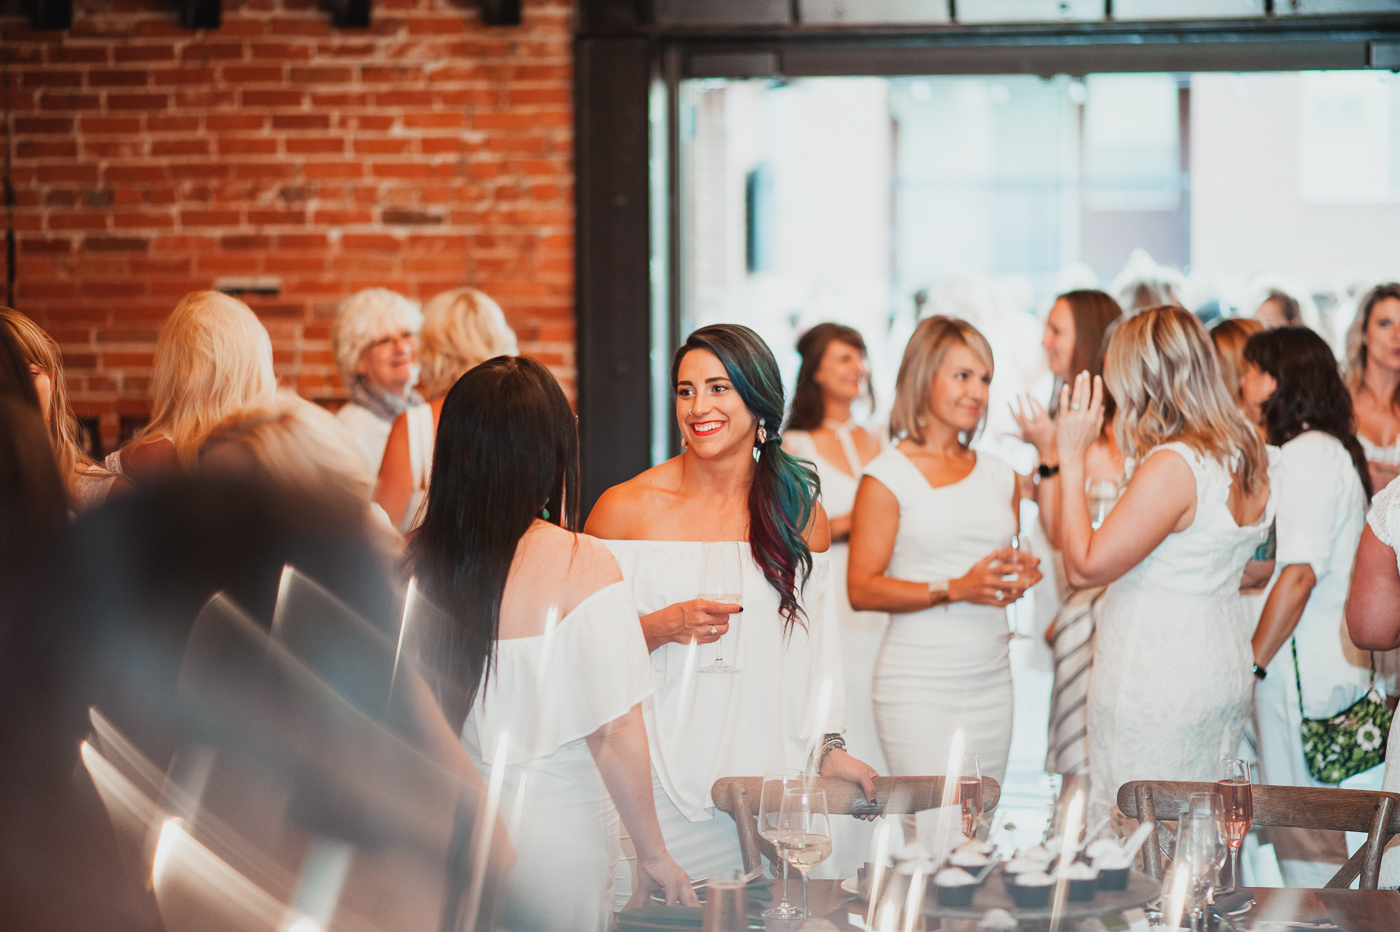 PHOCO Photography Fort Collins Women& White Event Ginger & Baker Lindsey Roselle-11.jpg